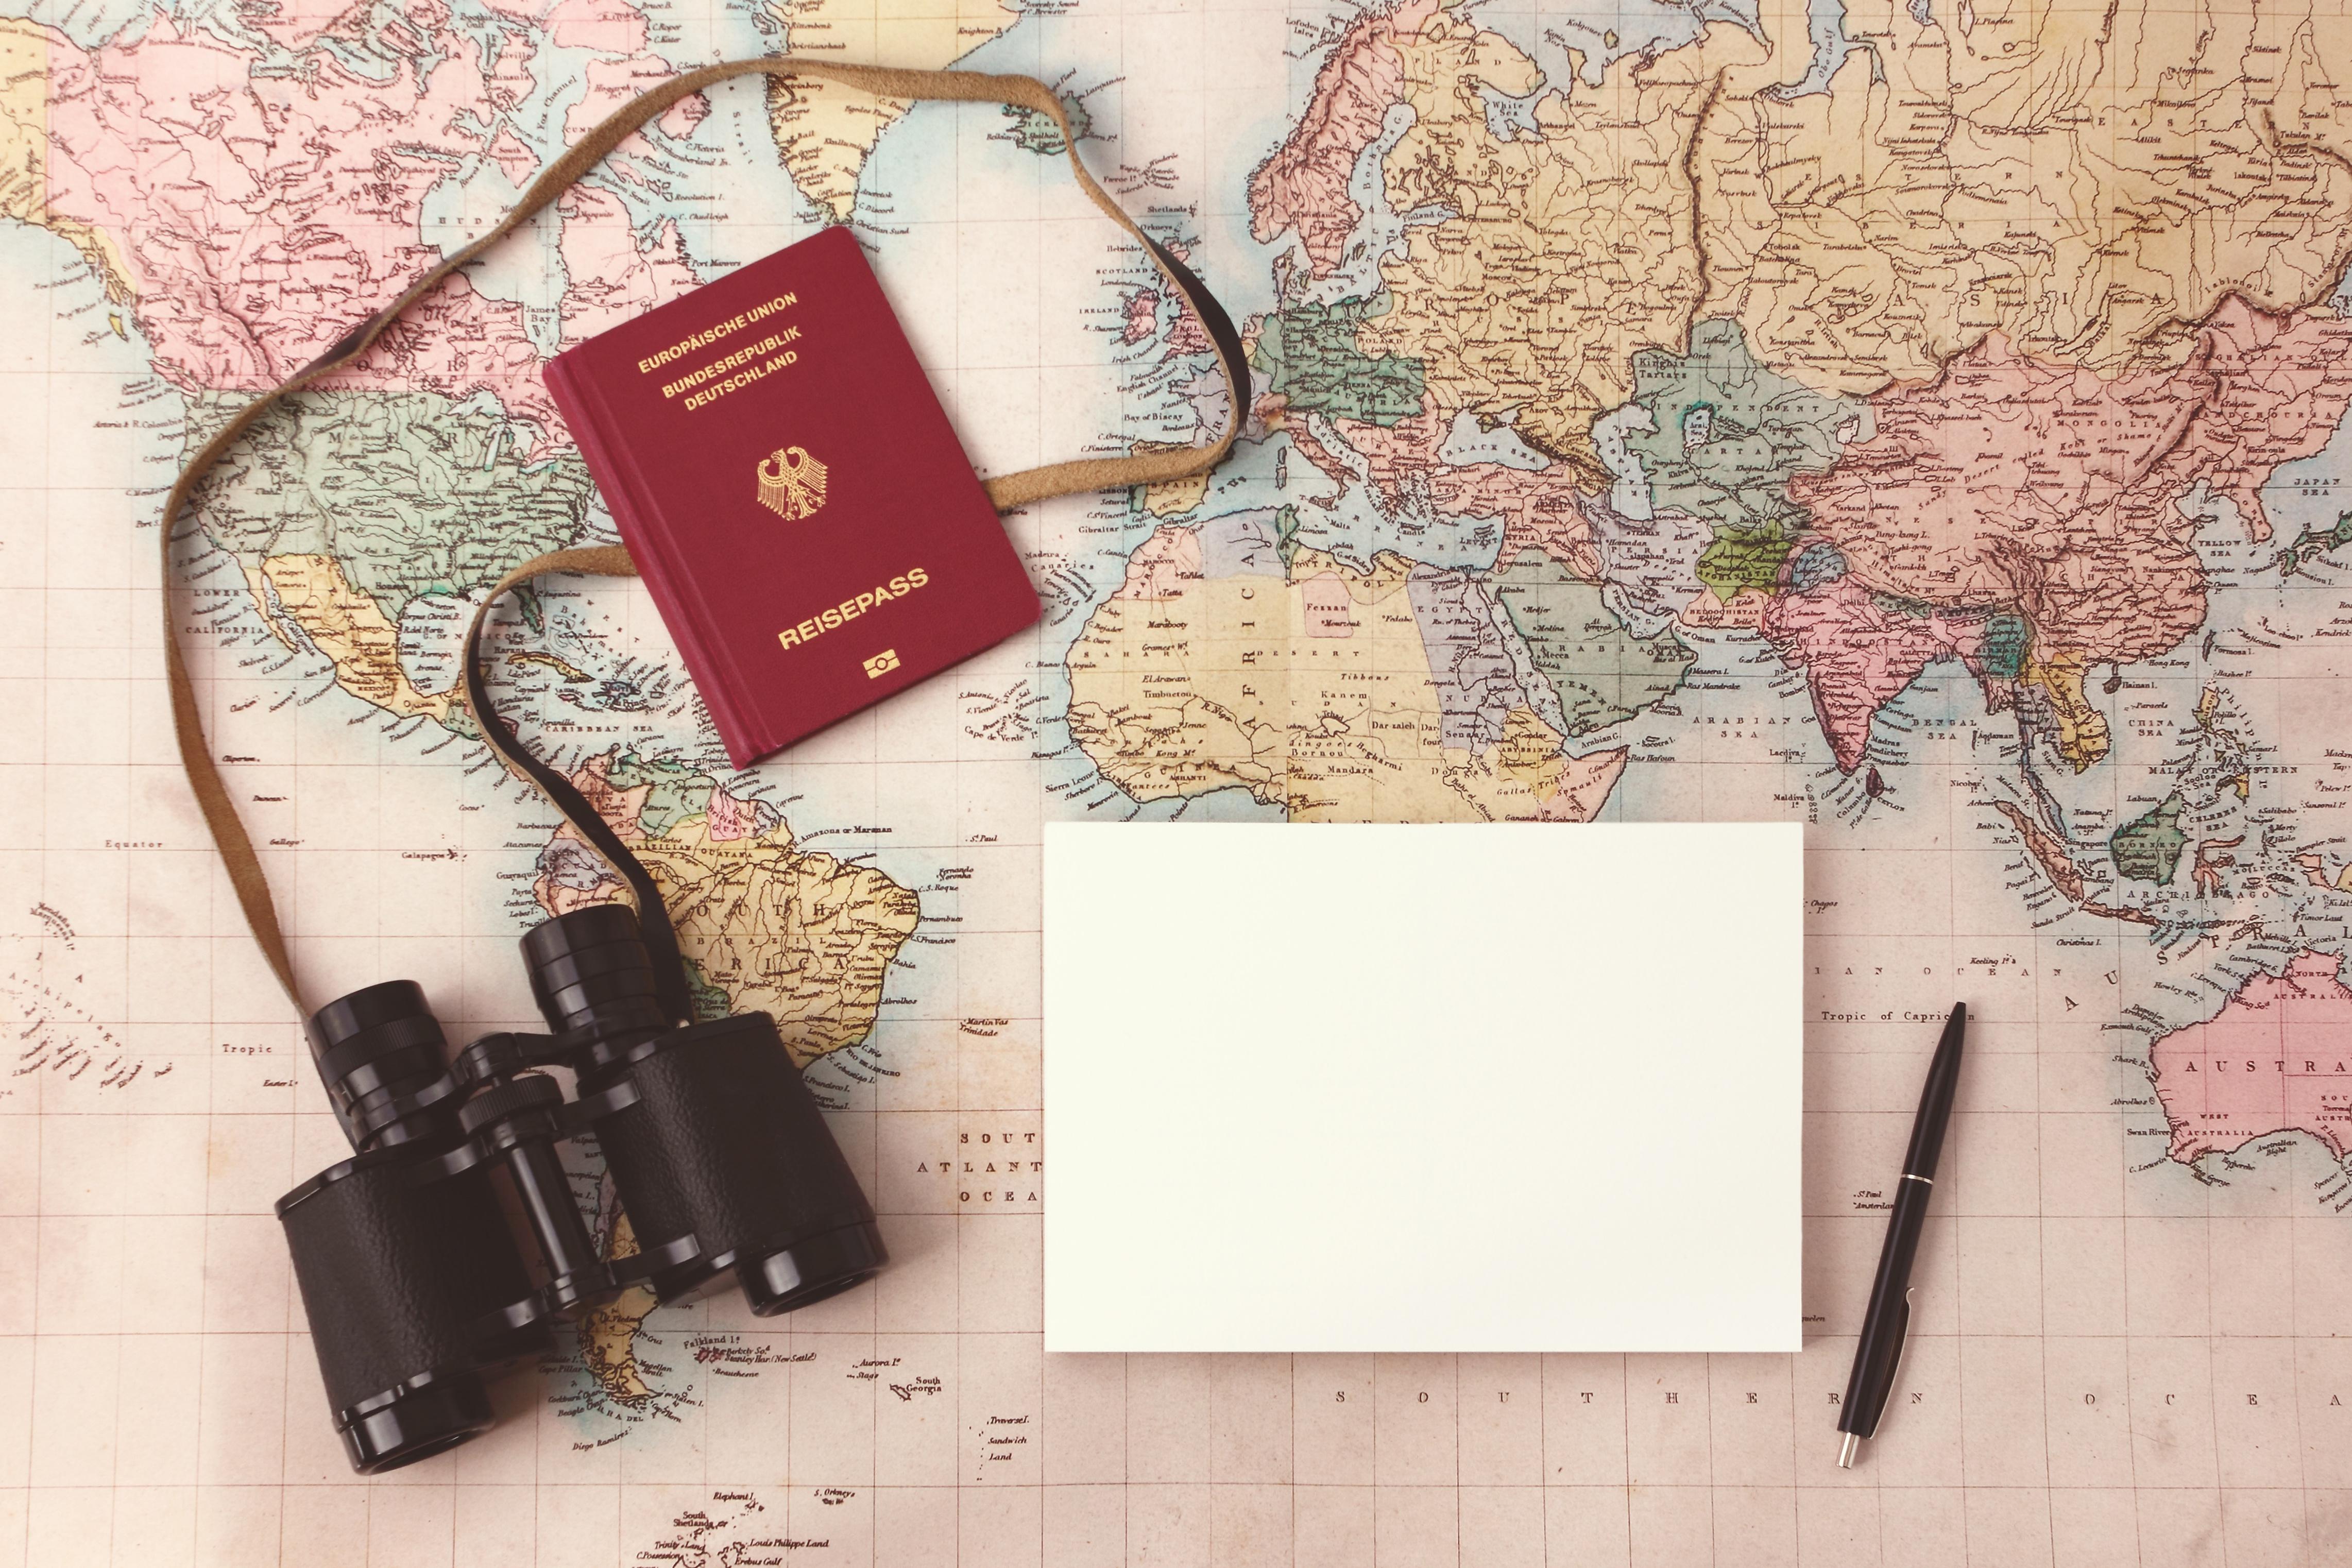 Download Wallpaper Map Paper Pen Binoculars Plans Travel - Us travel planning map